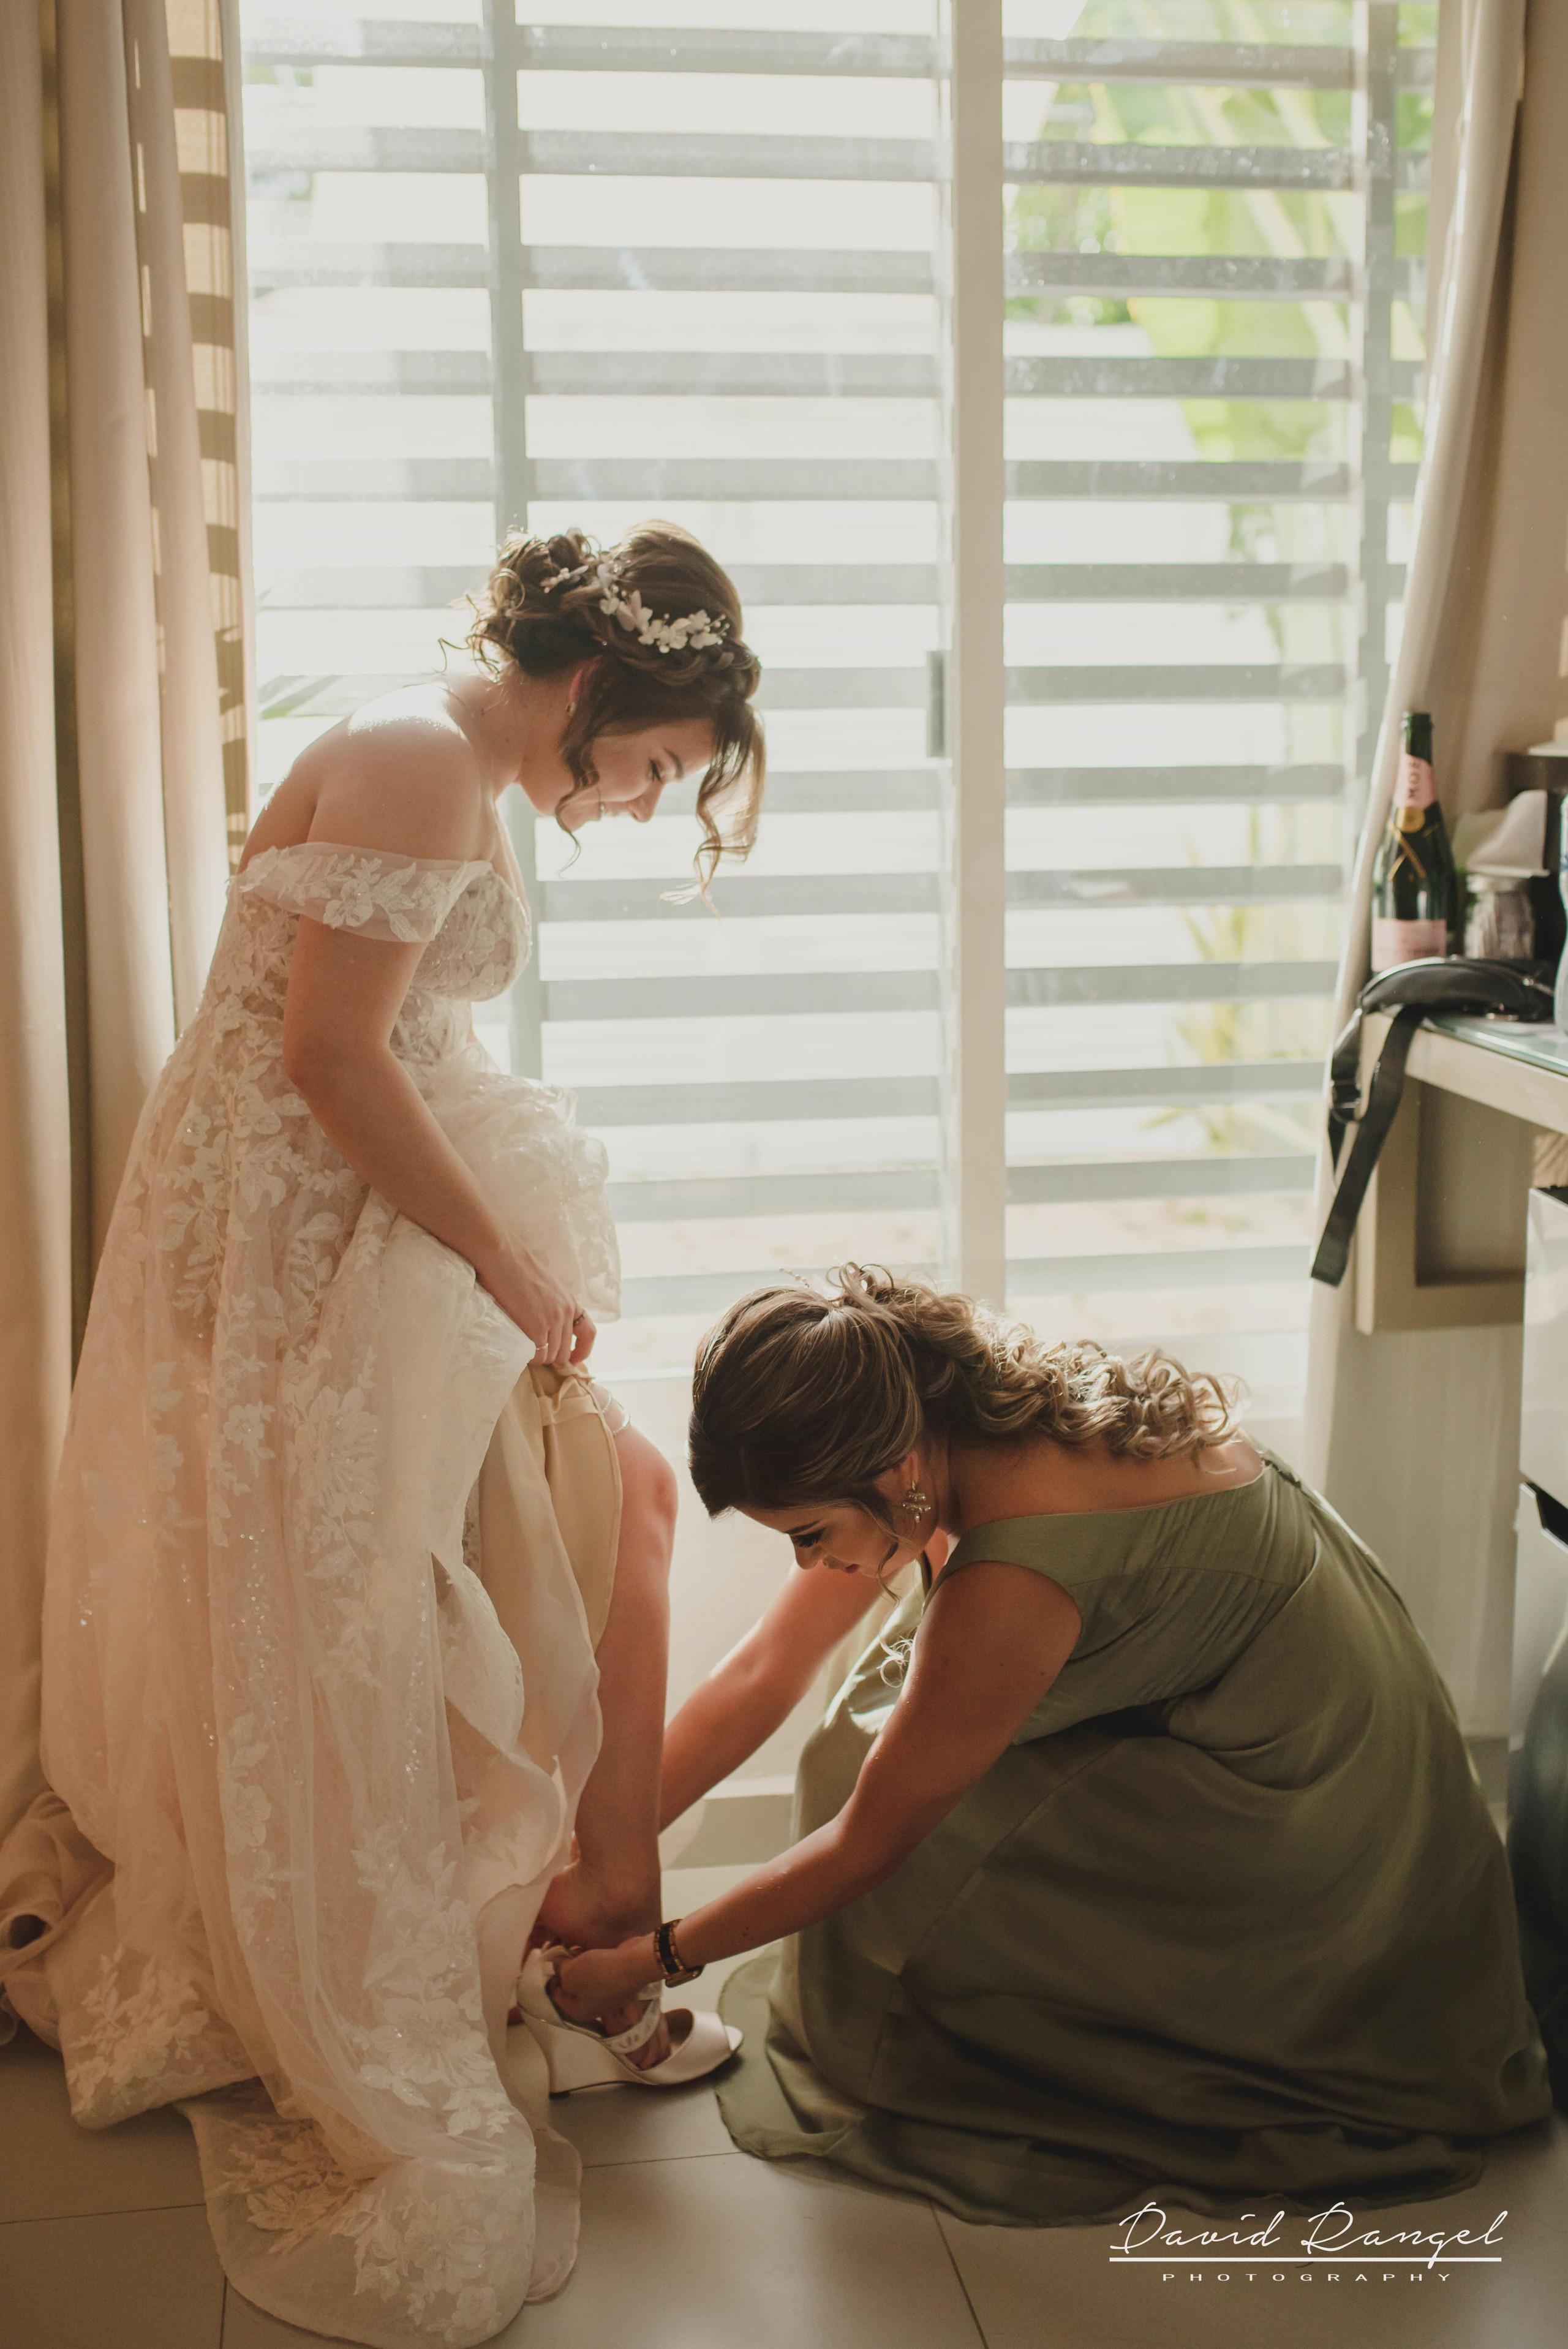 bride+getting+ready+shadow+earring++bathrobe+natural+ligh+photo+destination+wedding+isla+blanca+smile+mirror+photo+celebration+bridesmaids+bestfriend+shoes+help+wedding+dress